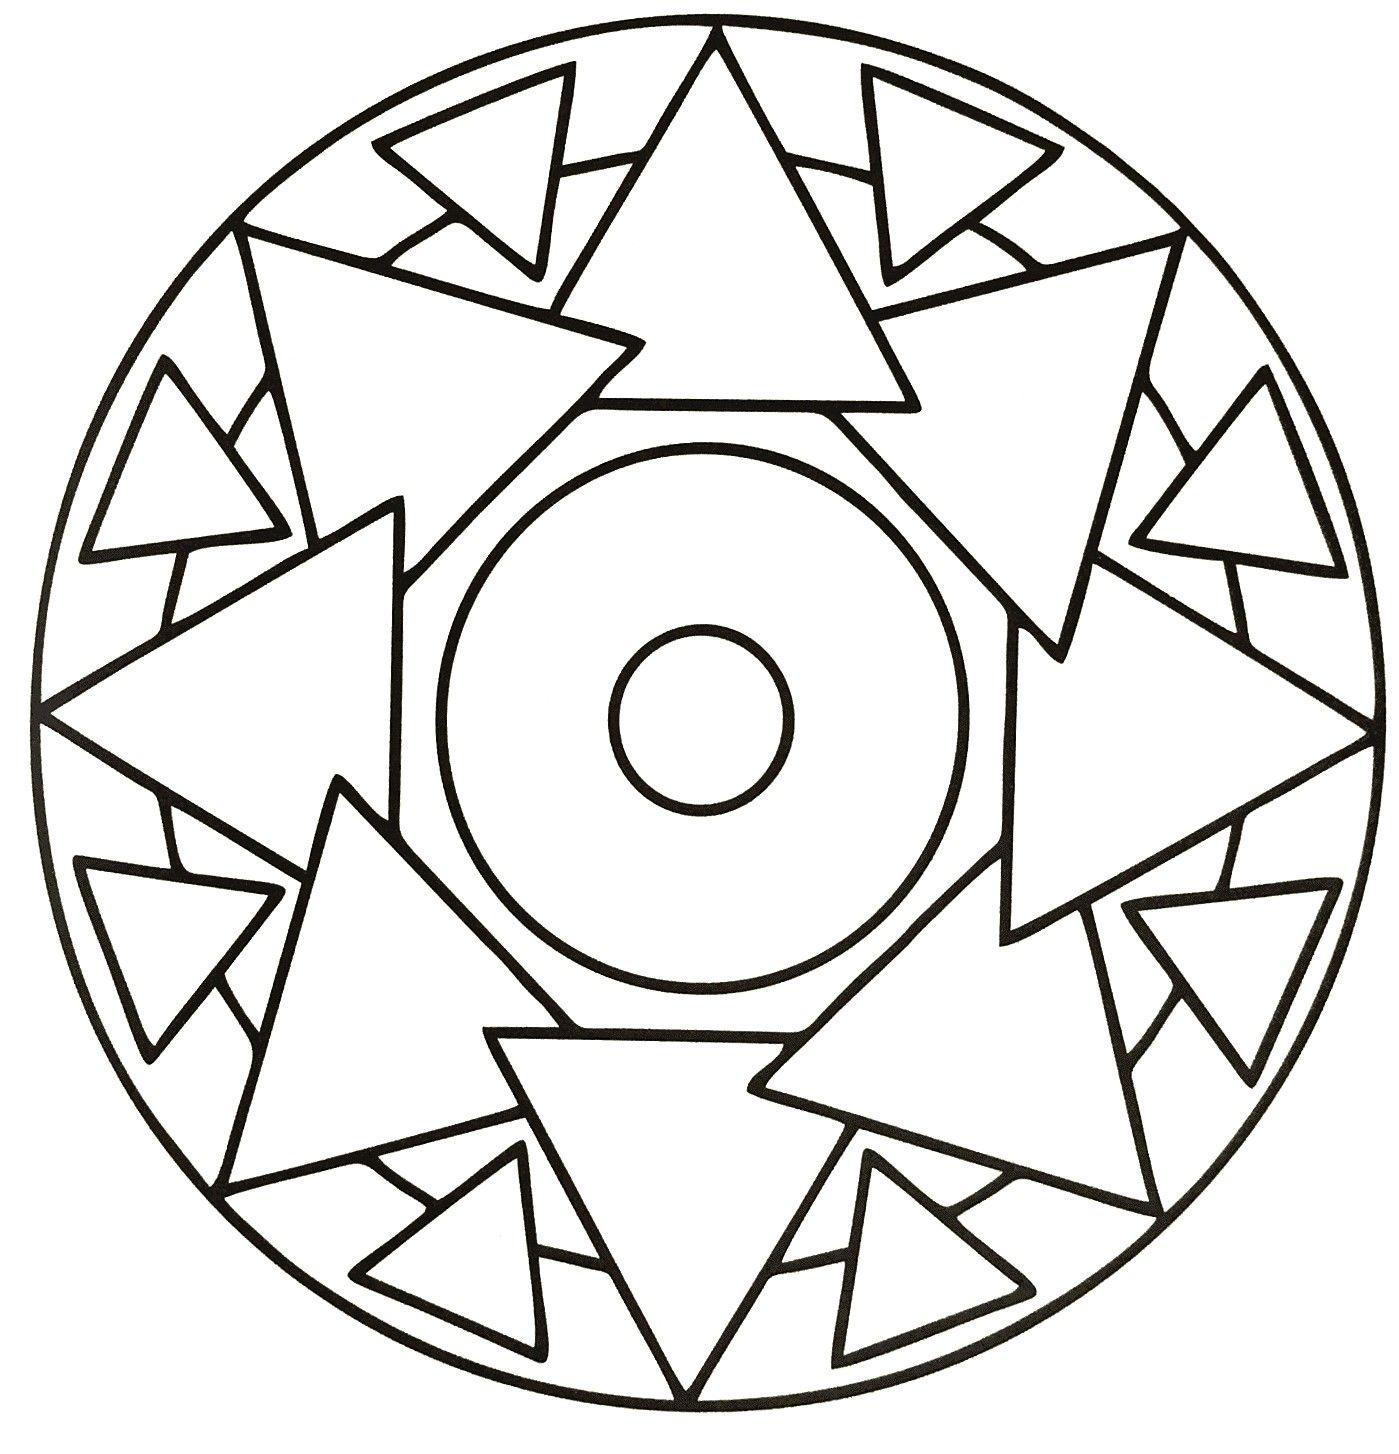 Mandalas for Kids Mandala coloring pages, Kids printable